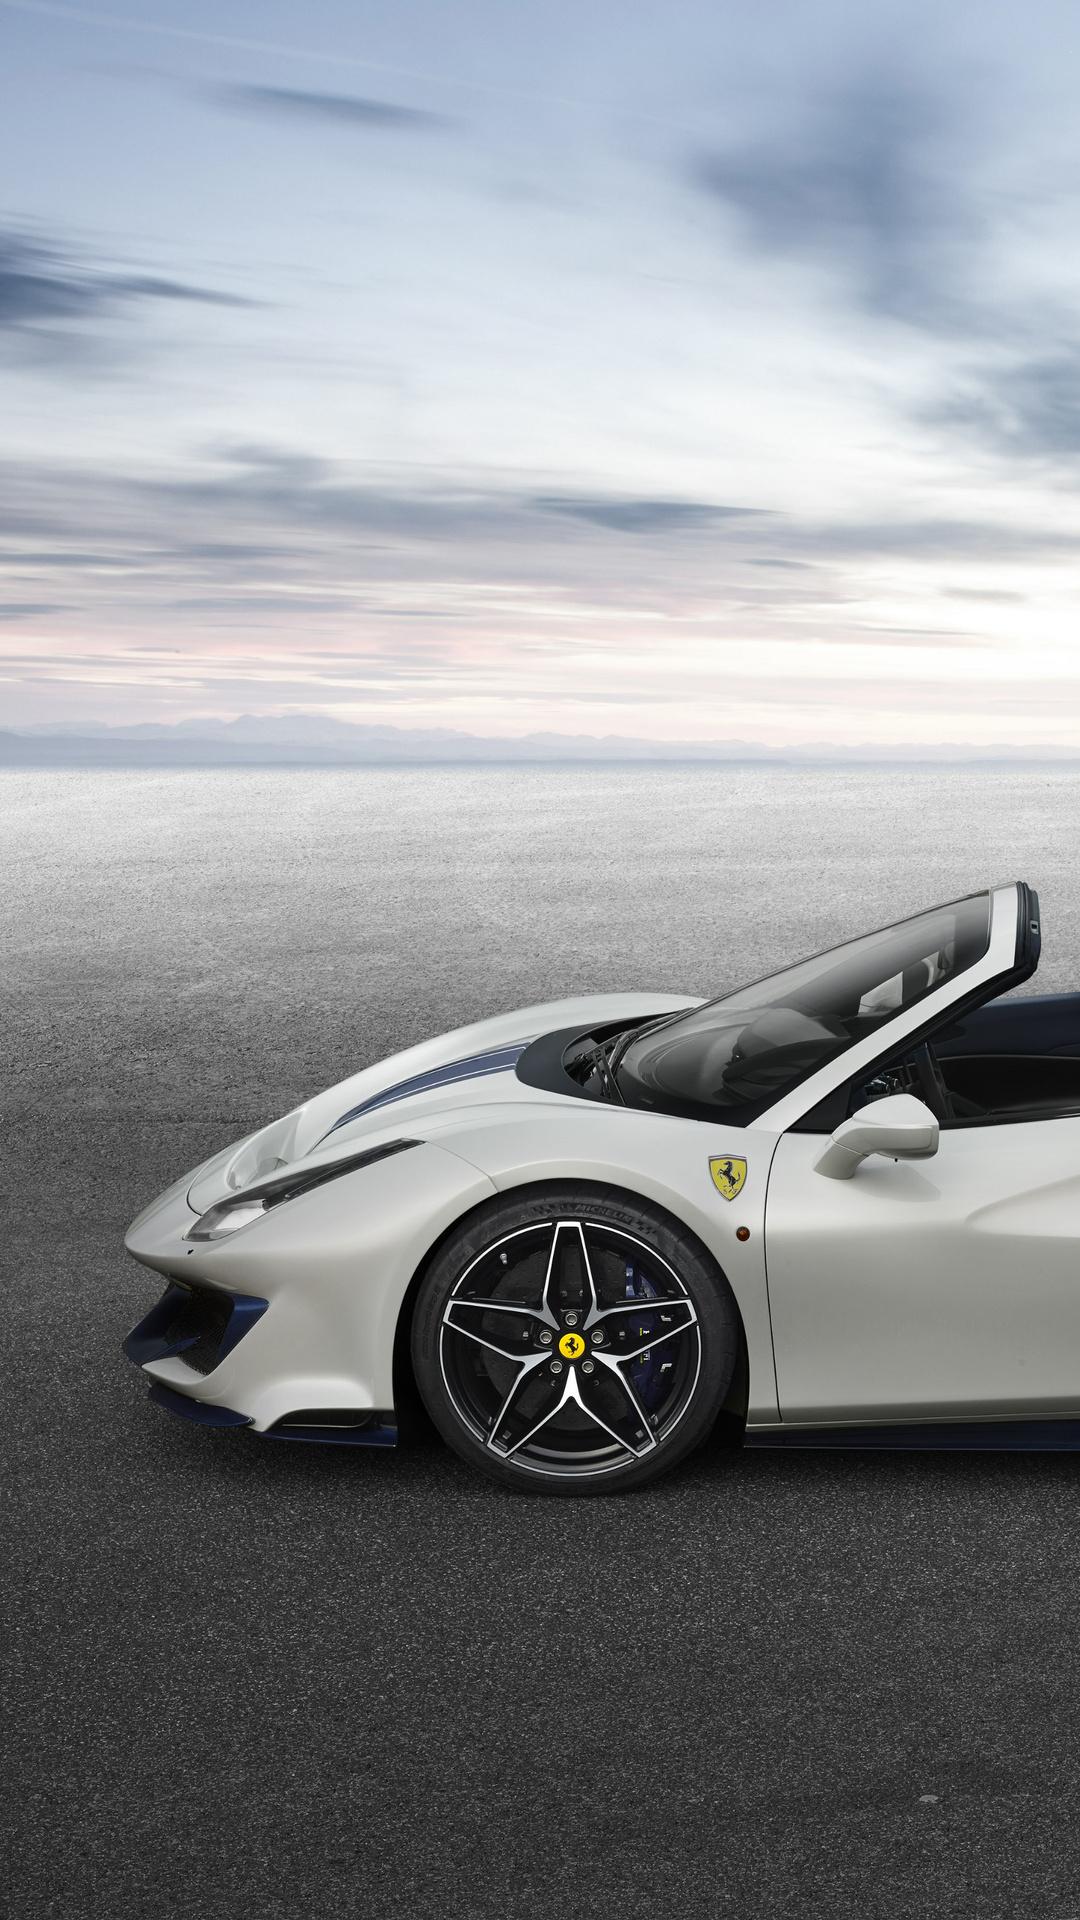 1080x1920 2018 Ferrari 488 Pista Spider Side View Iphone 7 ...